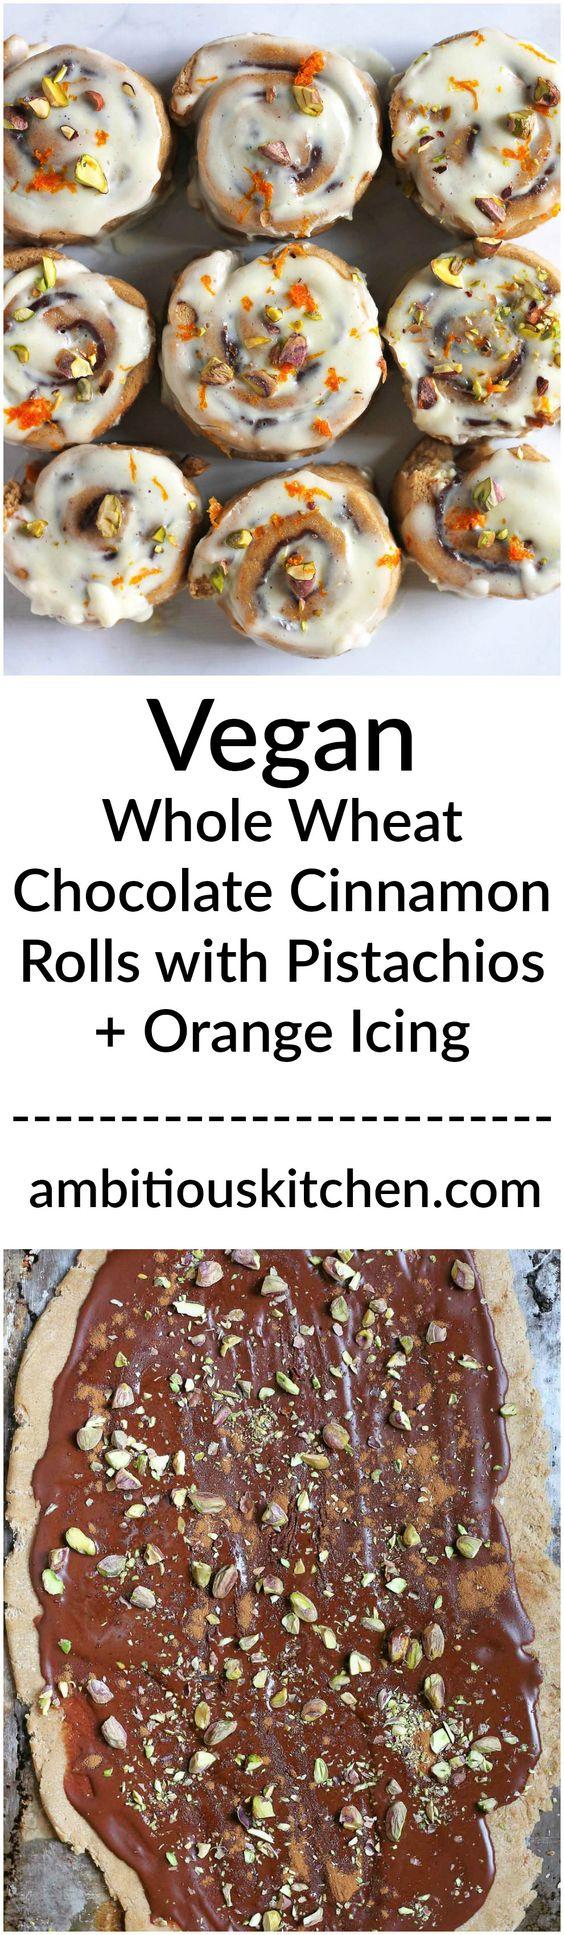 Cinnamon rolls, Vegans and Cinnamon on Pinterest